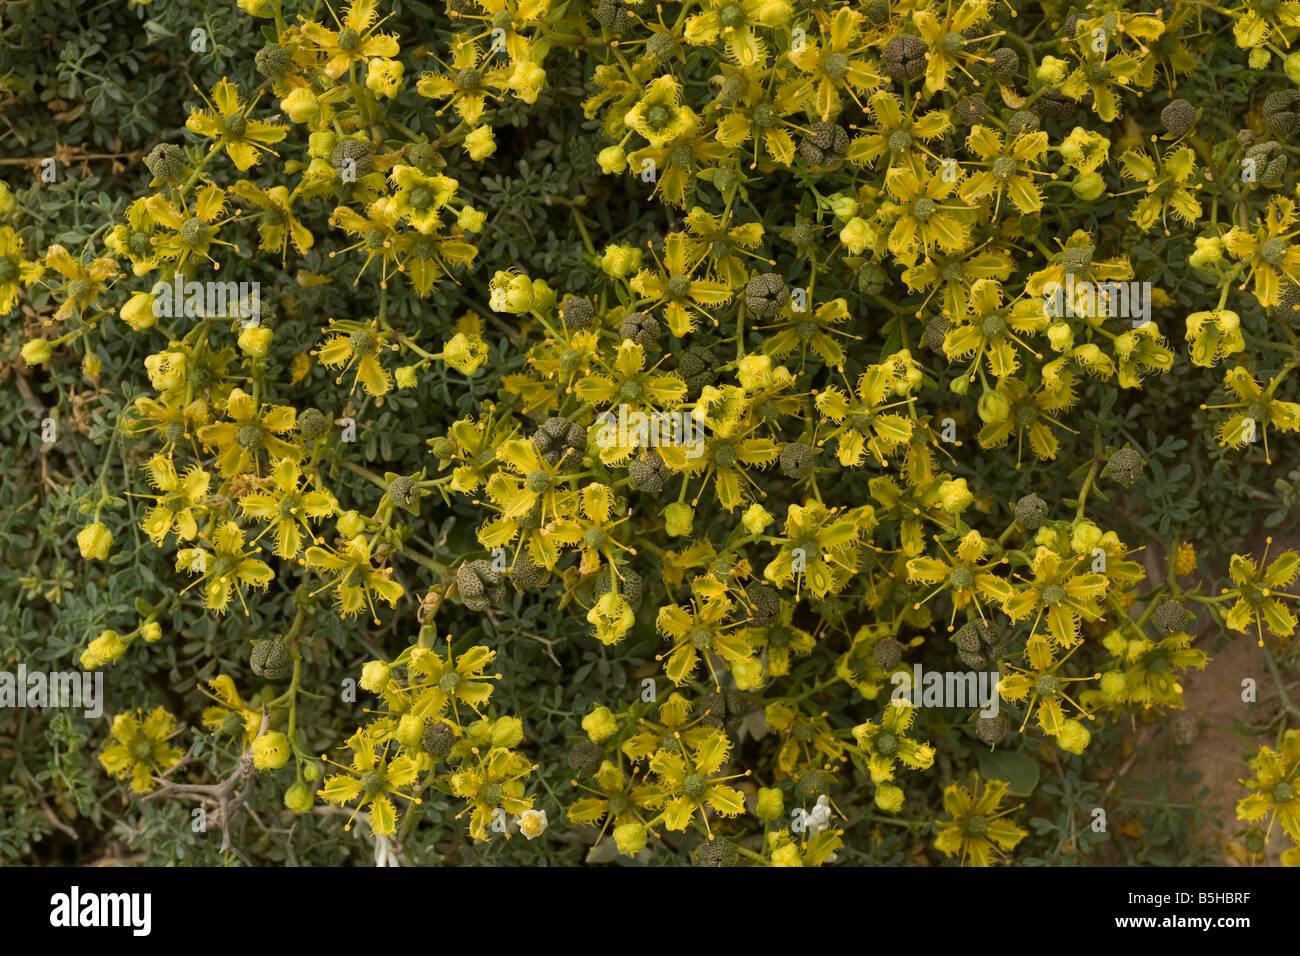 A dwarf Rue Ruta chalepensis ssp fumariifolia also known as Ruta fumariifolia in East Crete Aegean endemic - Stock Image